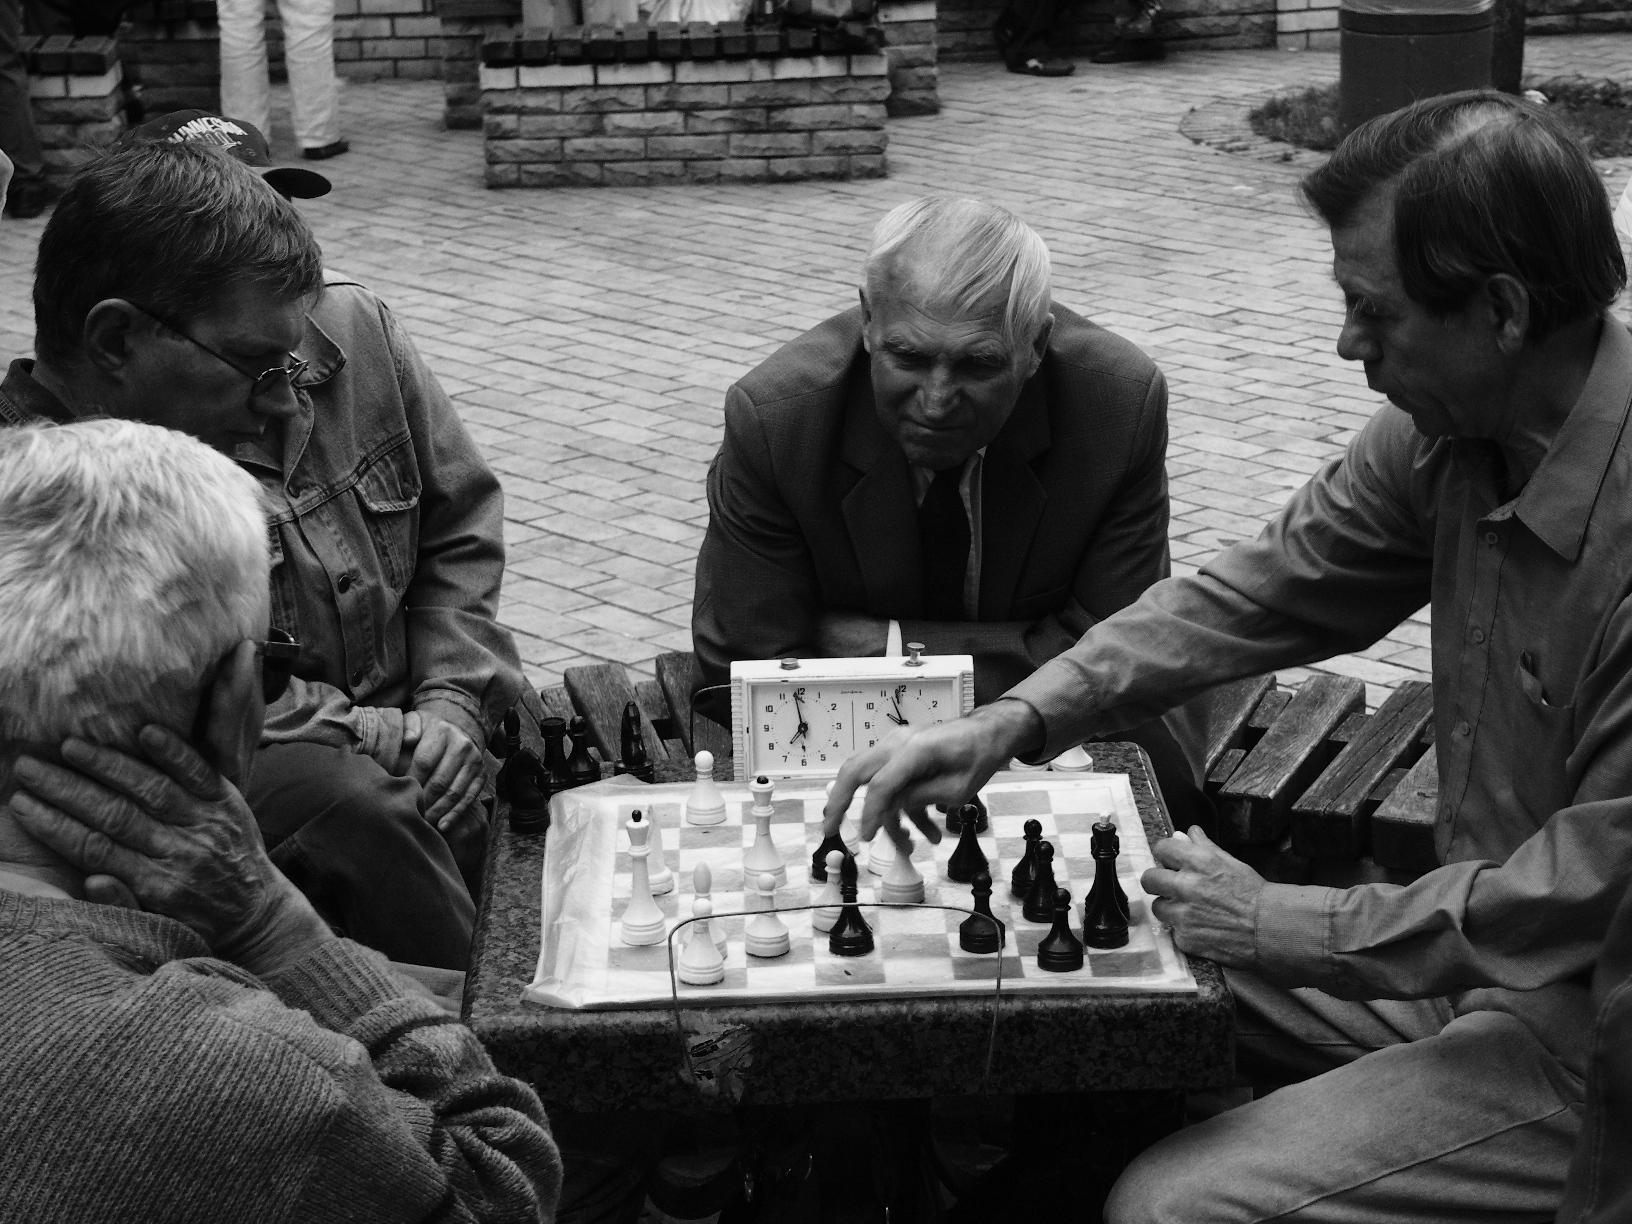 chess_players_in_park_kiev.JPG